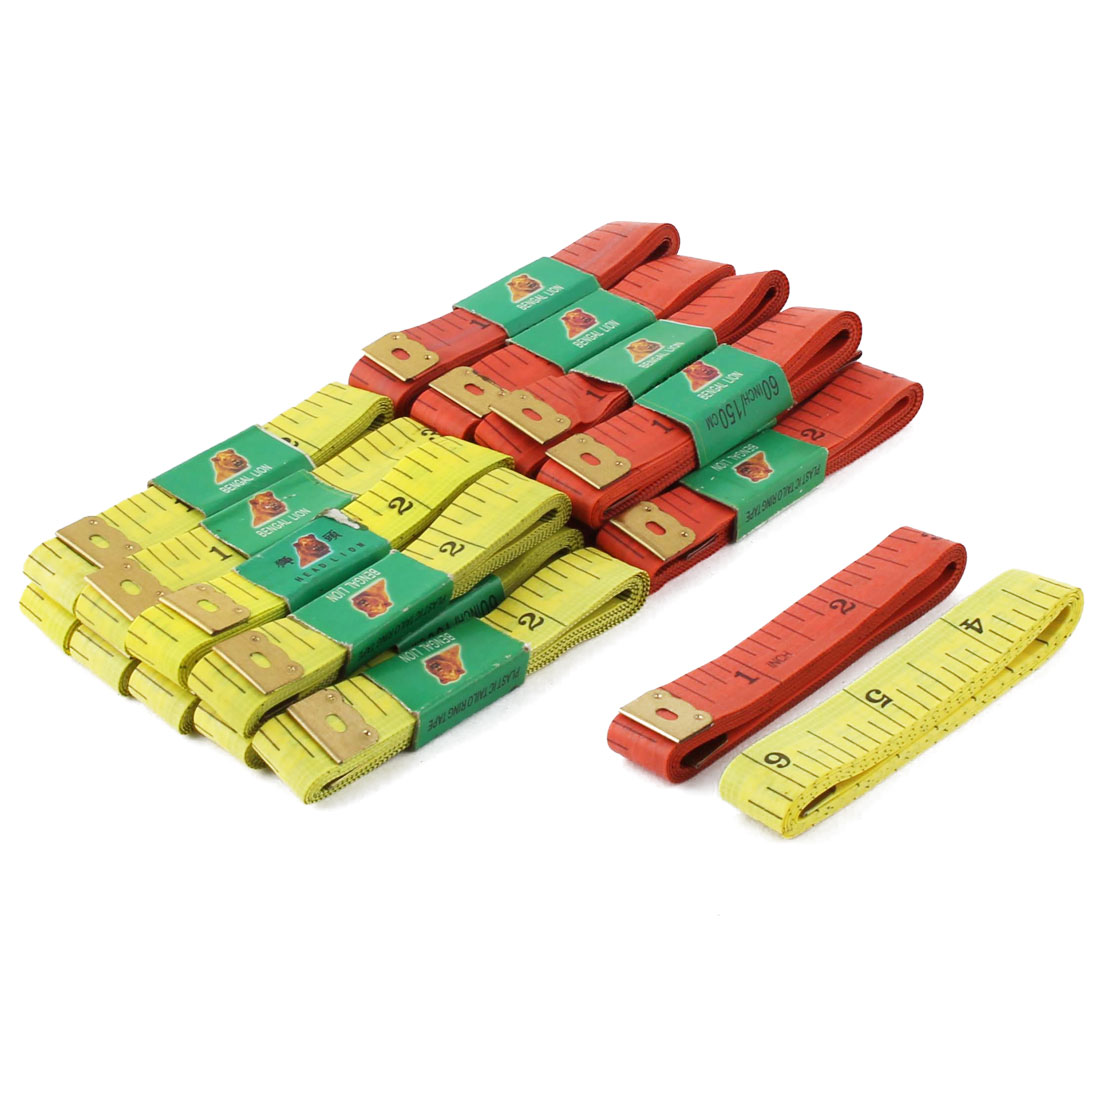 Sewing Tailor Plastic Body Clothes Measurement Tool Measure Soft Tape Ruler 150cm Length 20pcs